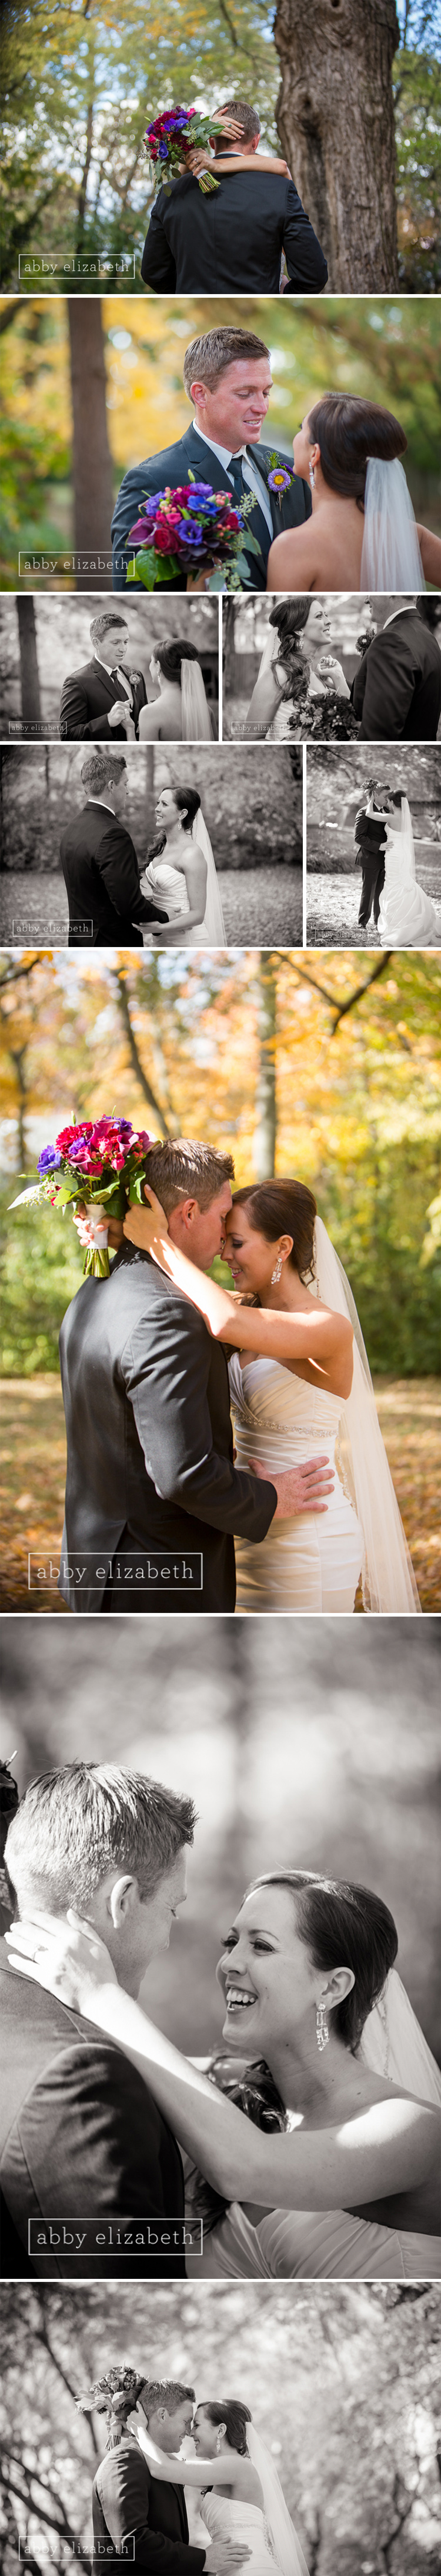 Fall_Wedding_Knoxville_TN_18.jpg